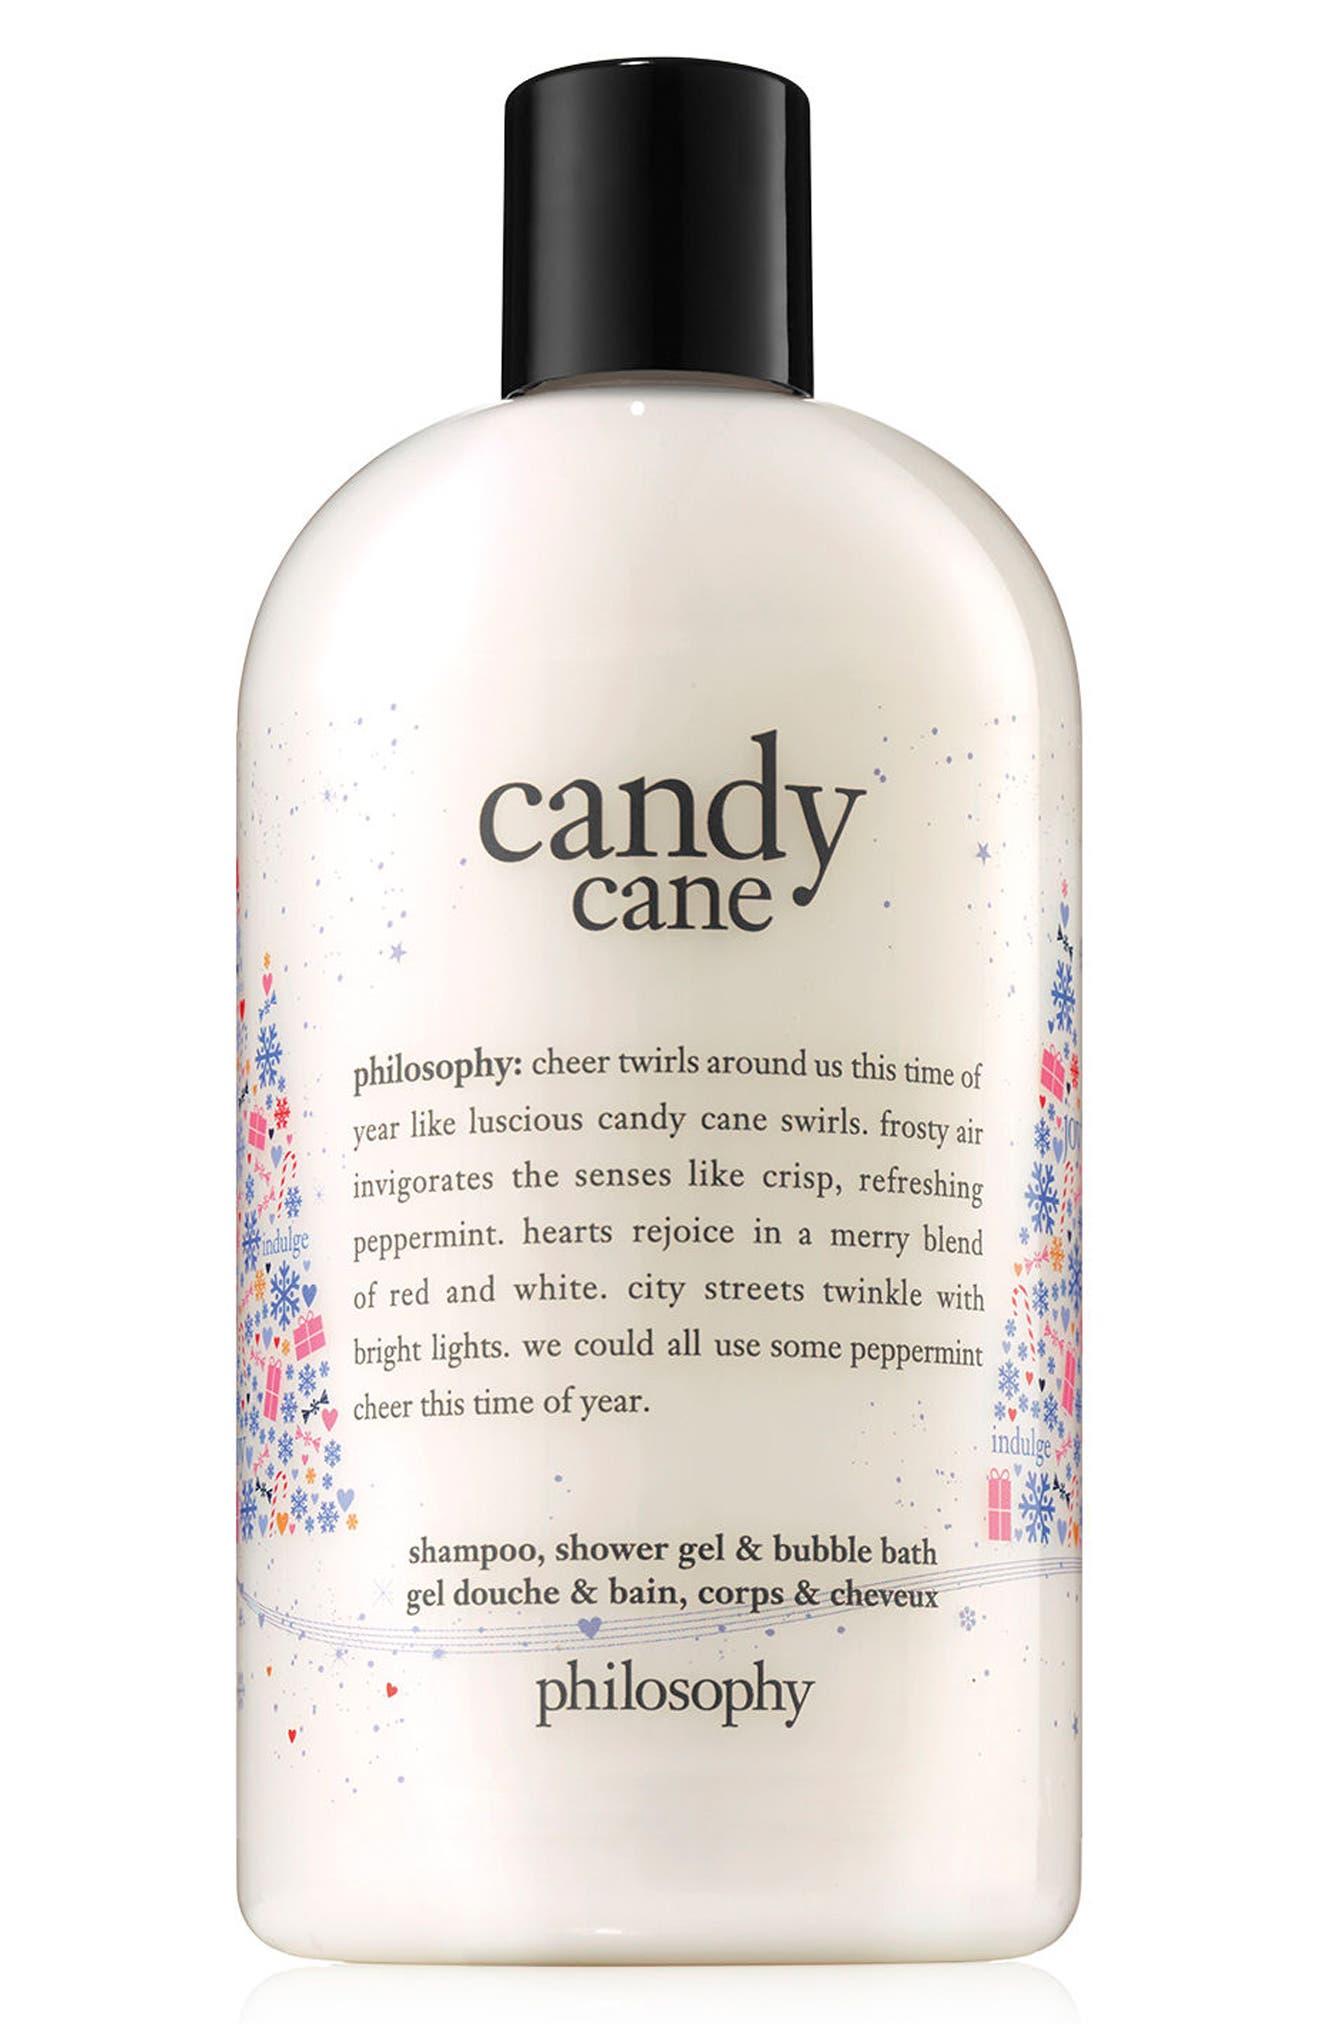 philosophy candy cane shampoo, shower gel & bubble bath (Limited Edition)